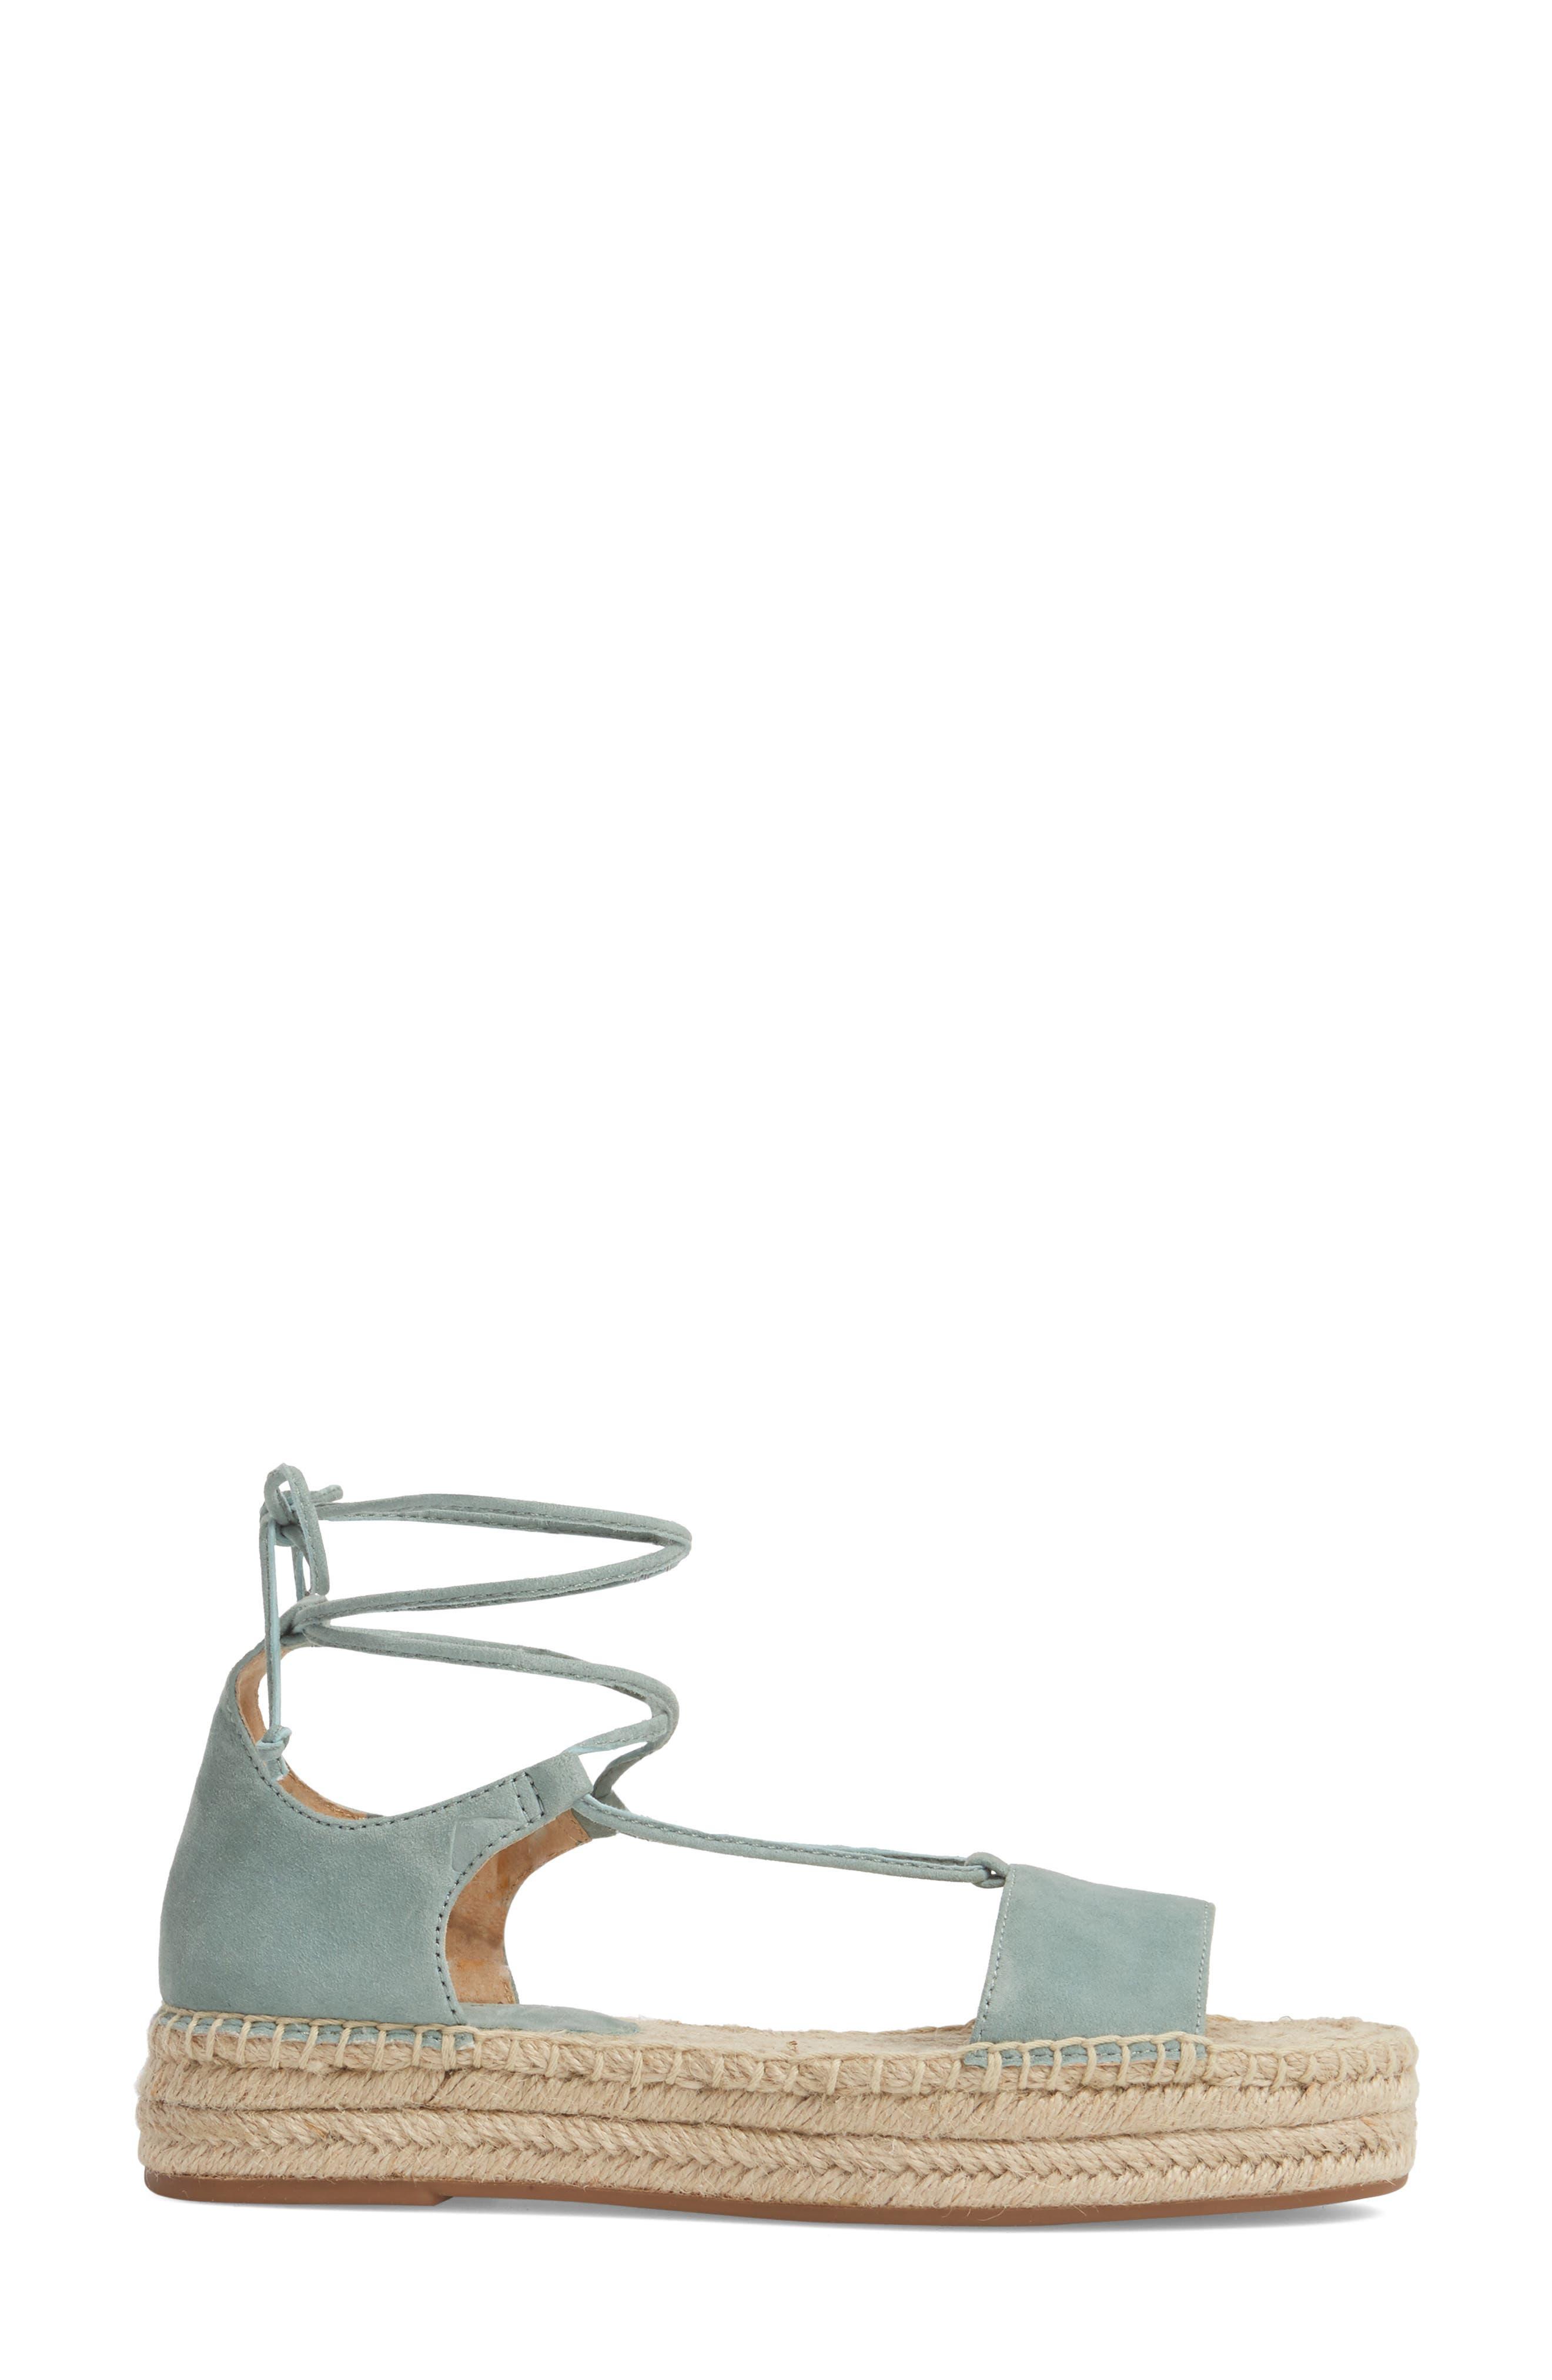 Fernanda Wraparound Platform Sandal,                             Alternate thumbnail 3, color,                             Deco Green Suede